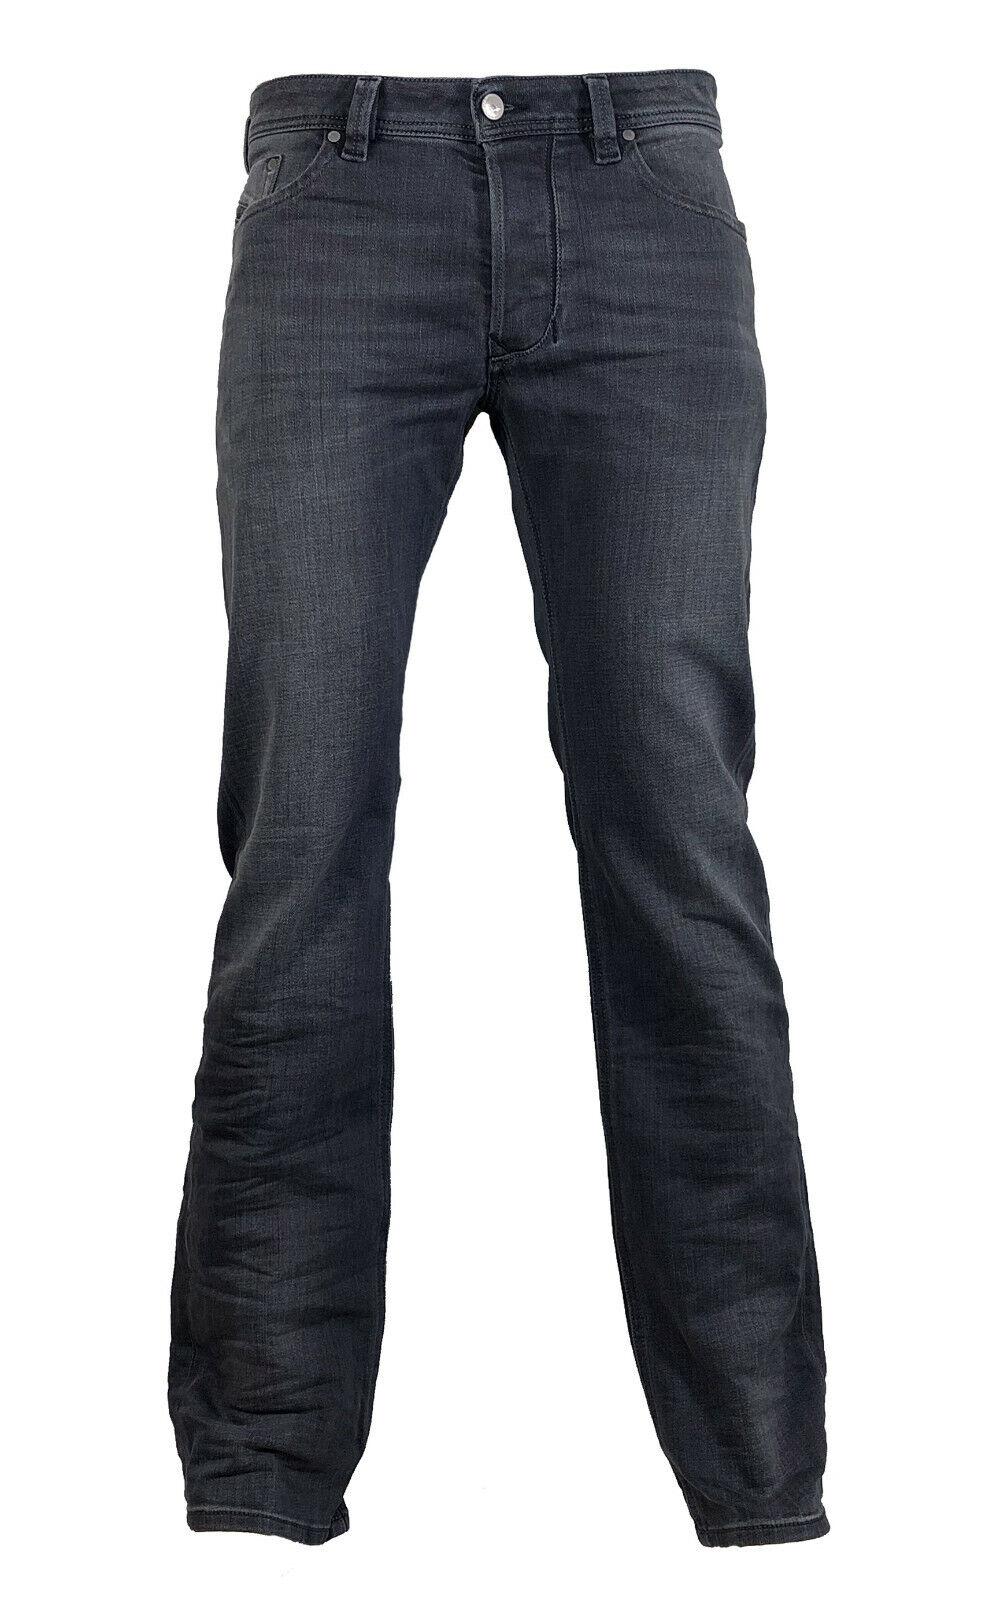 Diesel  Straight Cut  Stretch Jeans LARKEE 084JK grey  Gr. 28 32 NEU